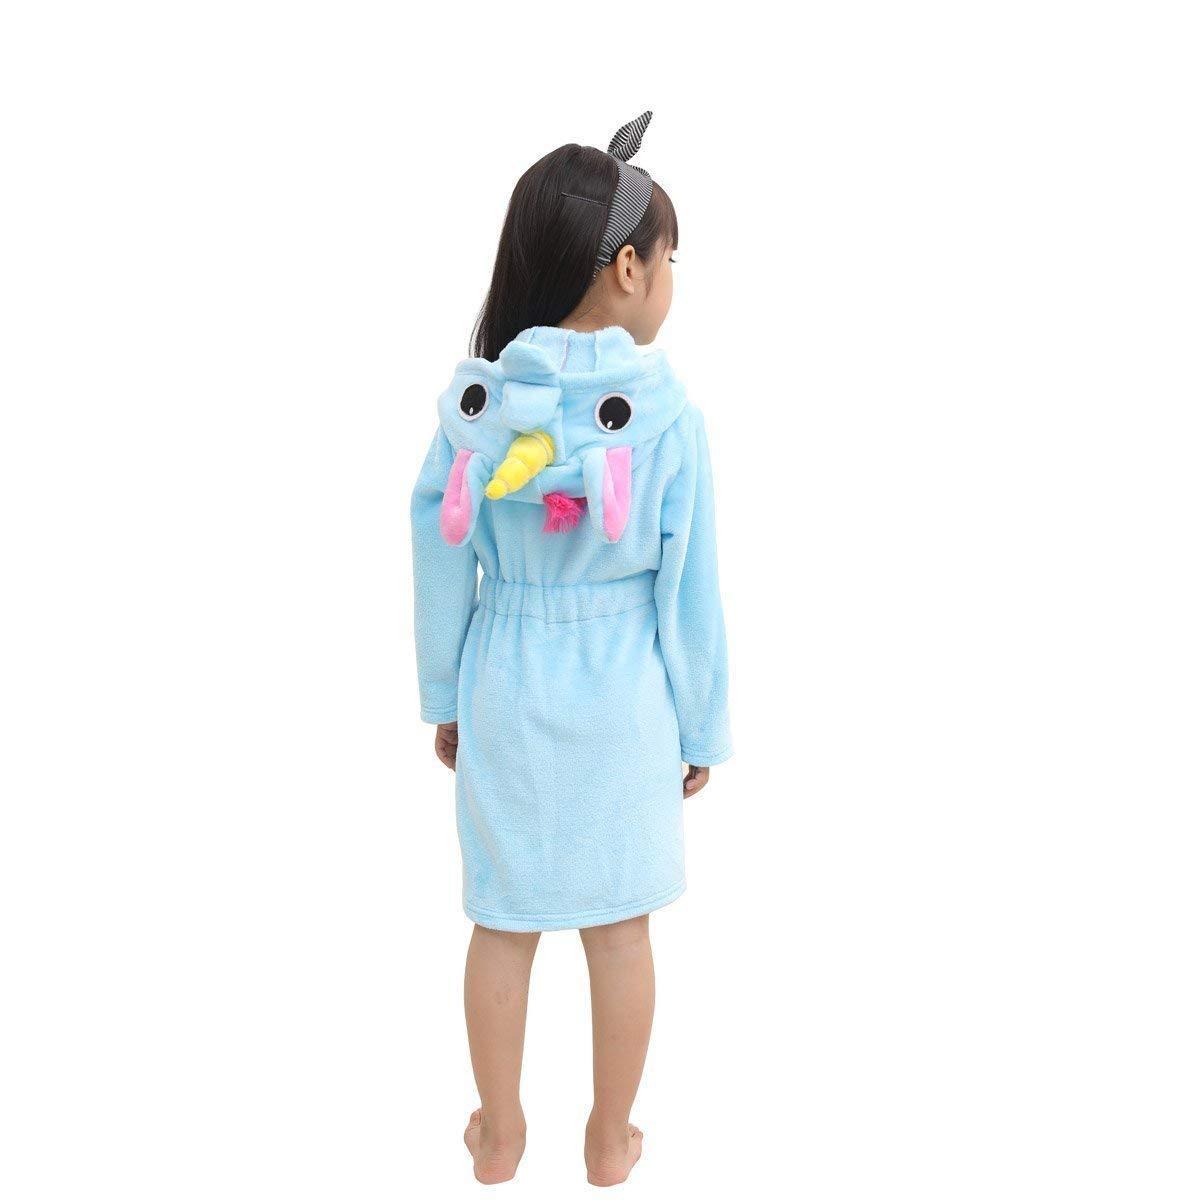 Robe for Kids Flannel Soft Bathrobe Unicorn Fleece Sleepwear Comfortable Loungewear